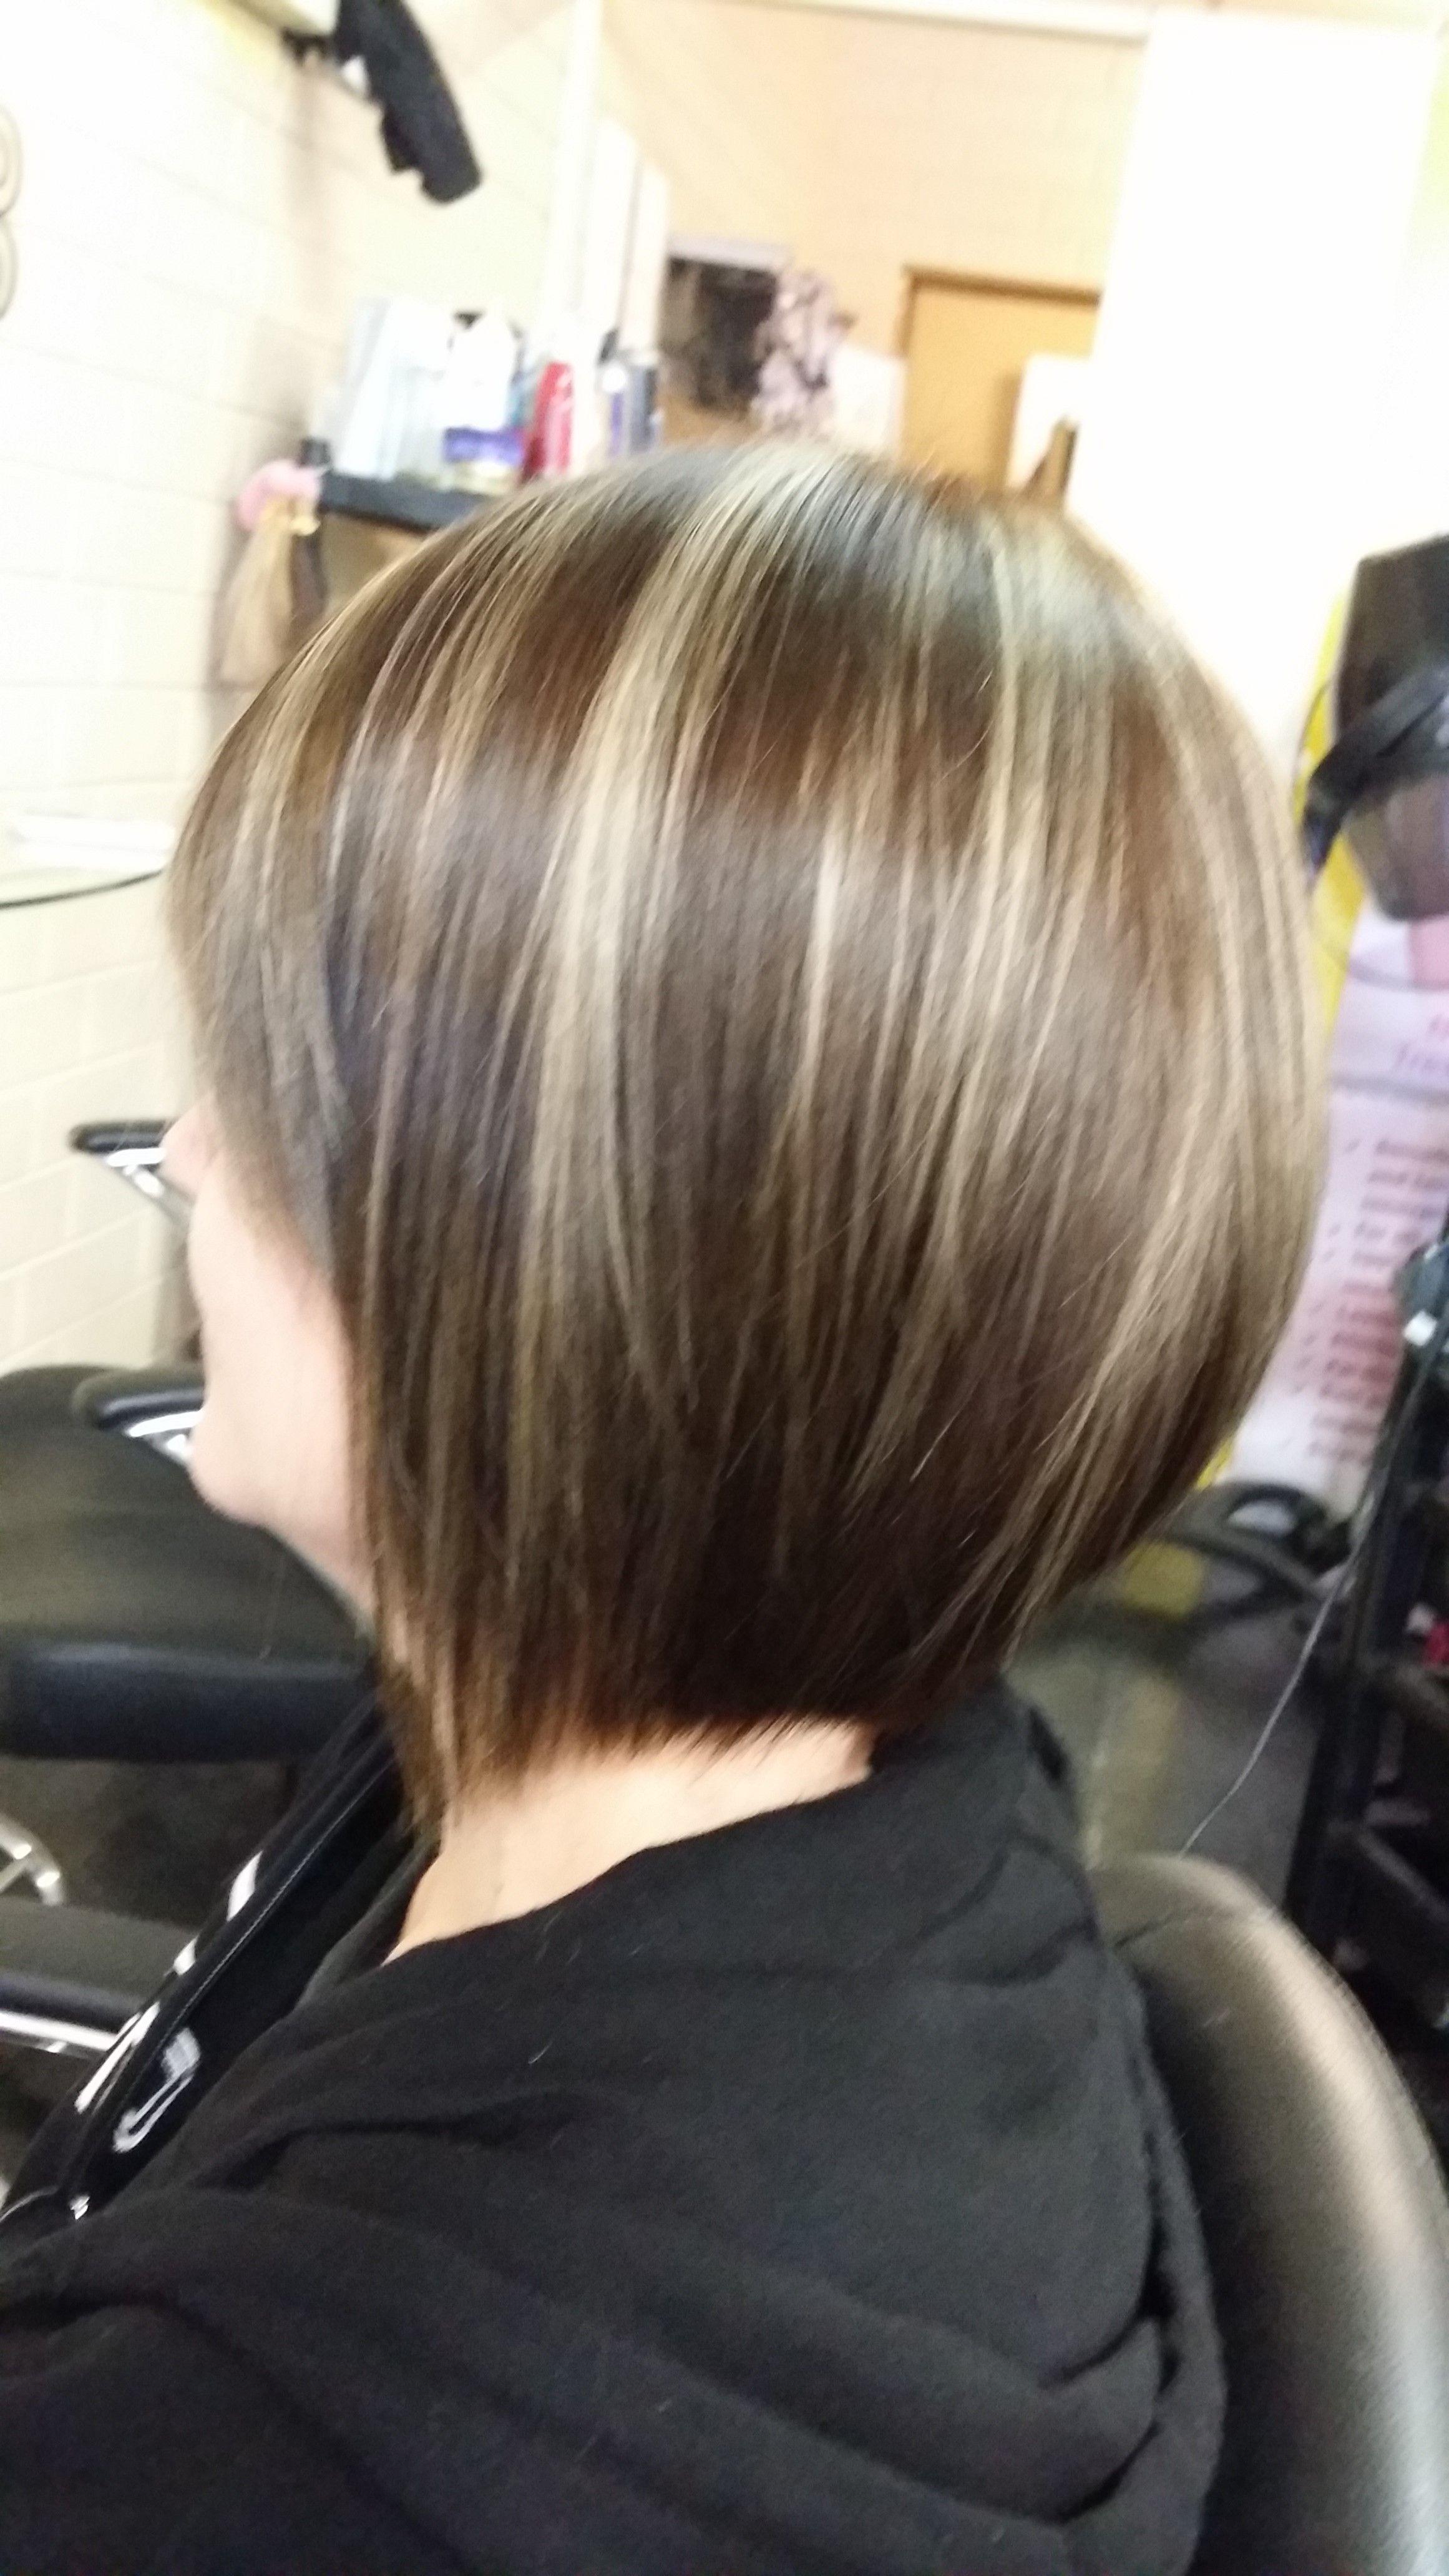 Concave Bob With Foils And Colour Light Hair Color Hair Highlights And Lowlights Hair Highlights